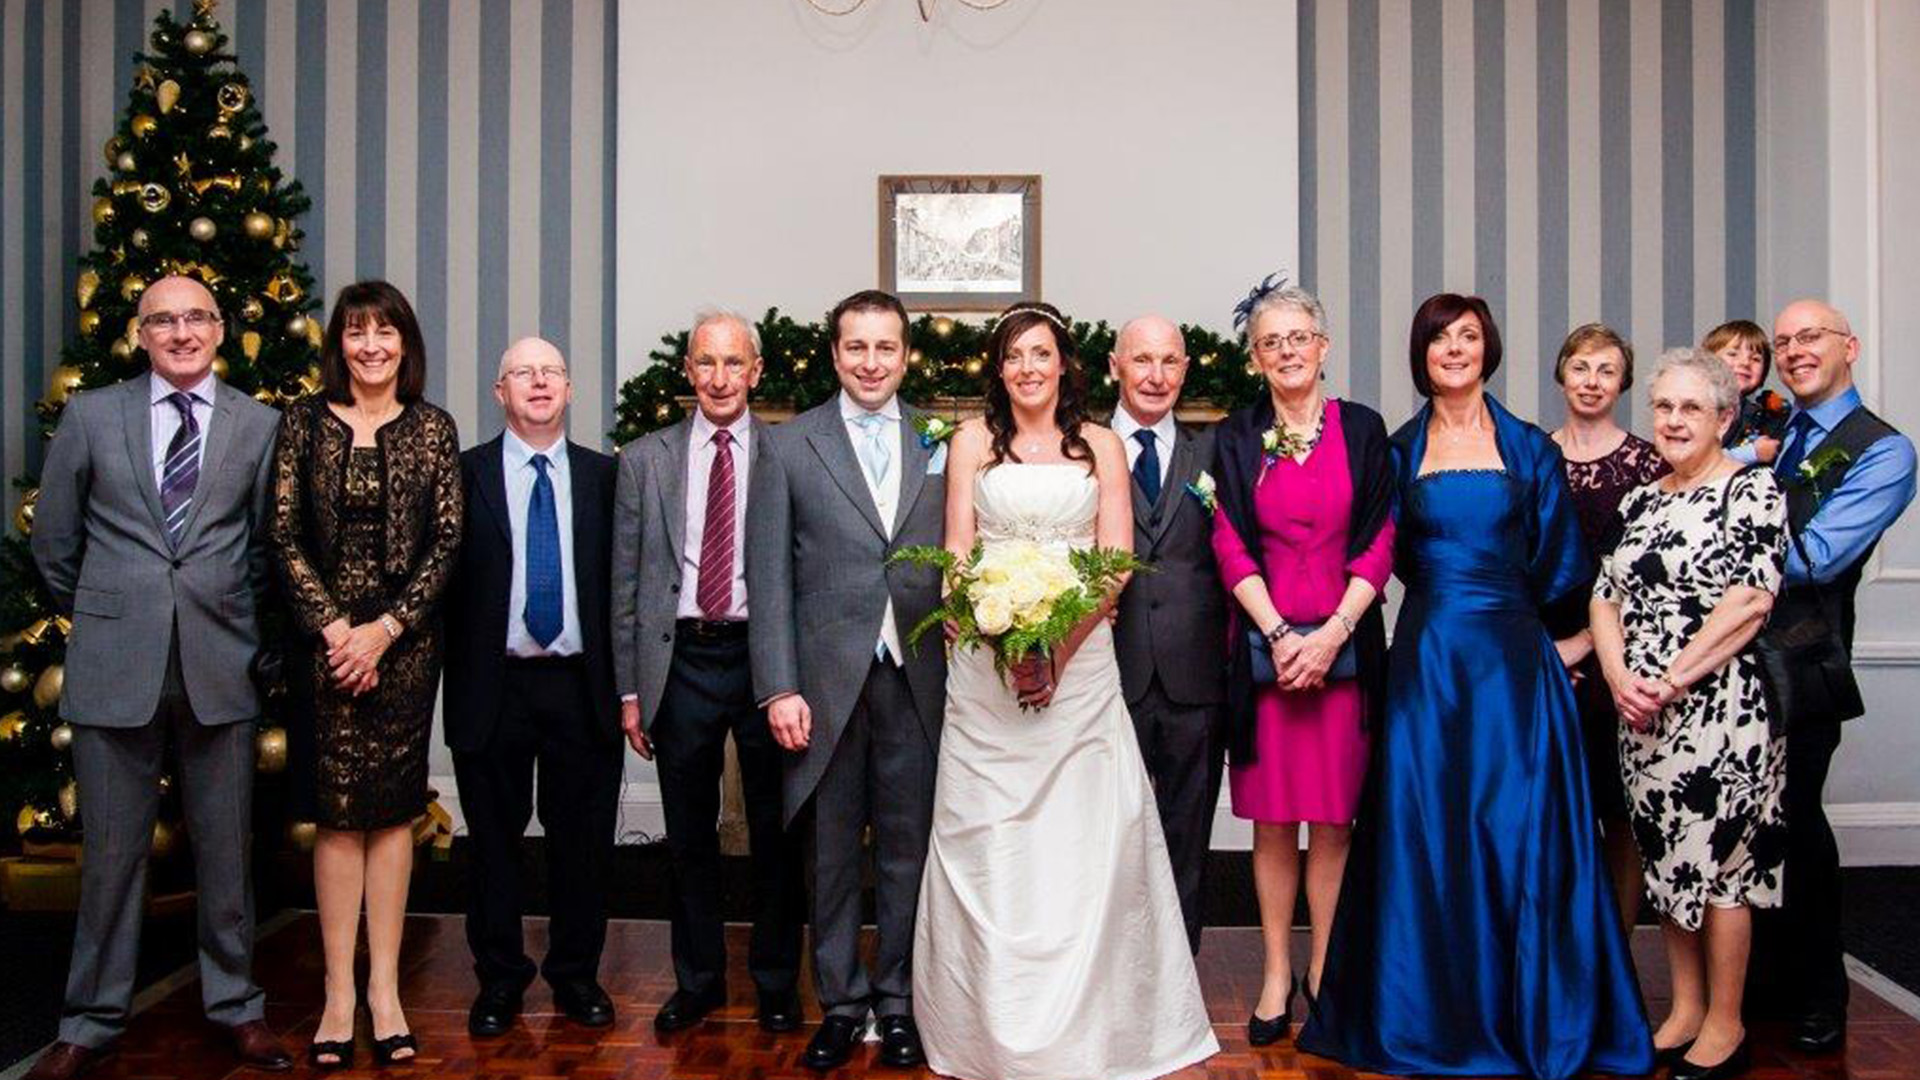 Wedding Venues in Hampshire Mercure Southampton Centre Dolphin Hotel winter wedding venues 7